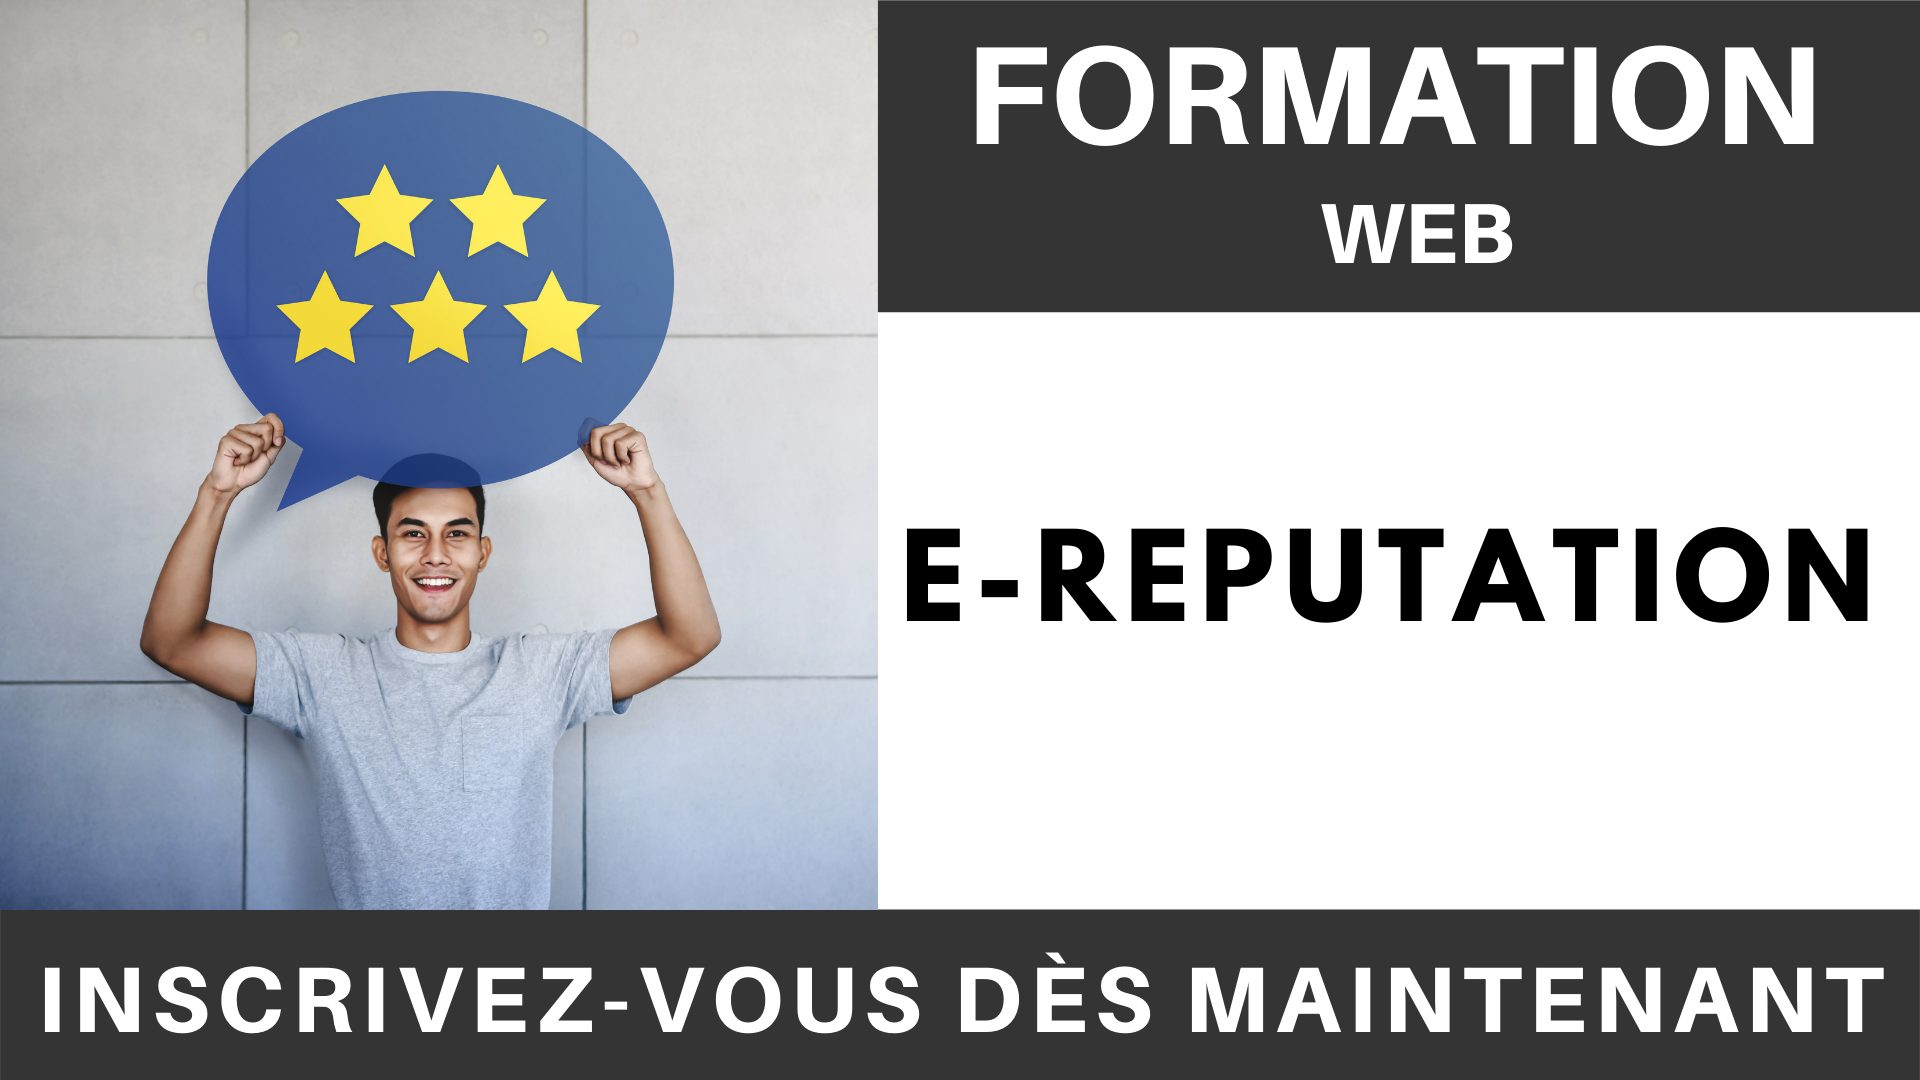 Formation WEB - E-Reputation (1)